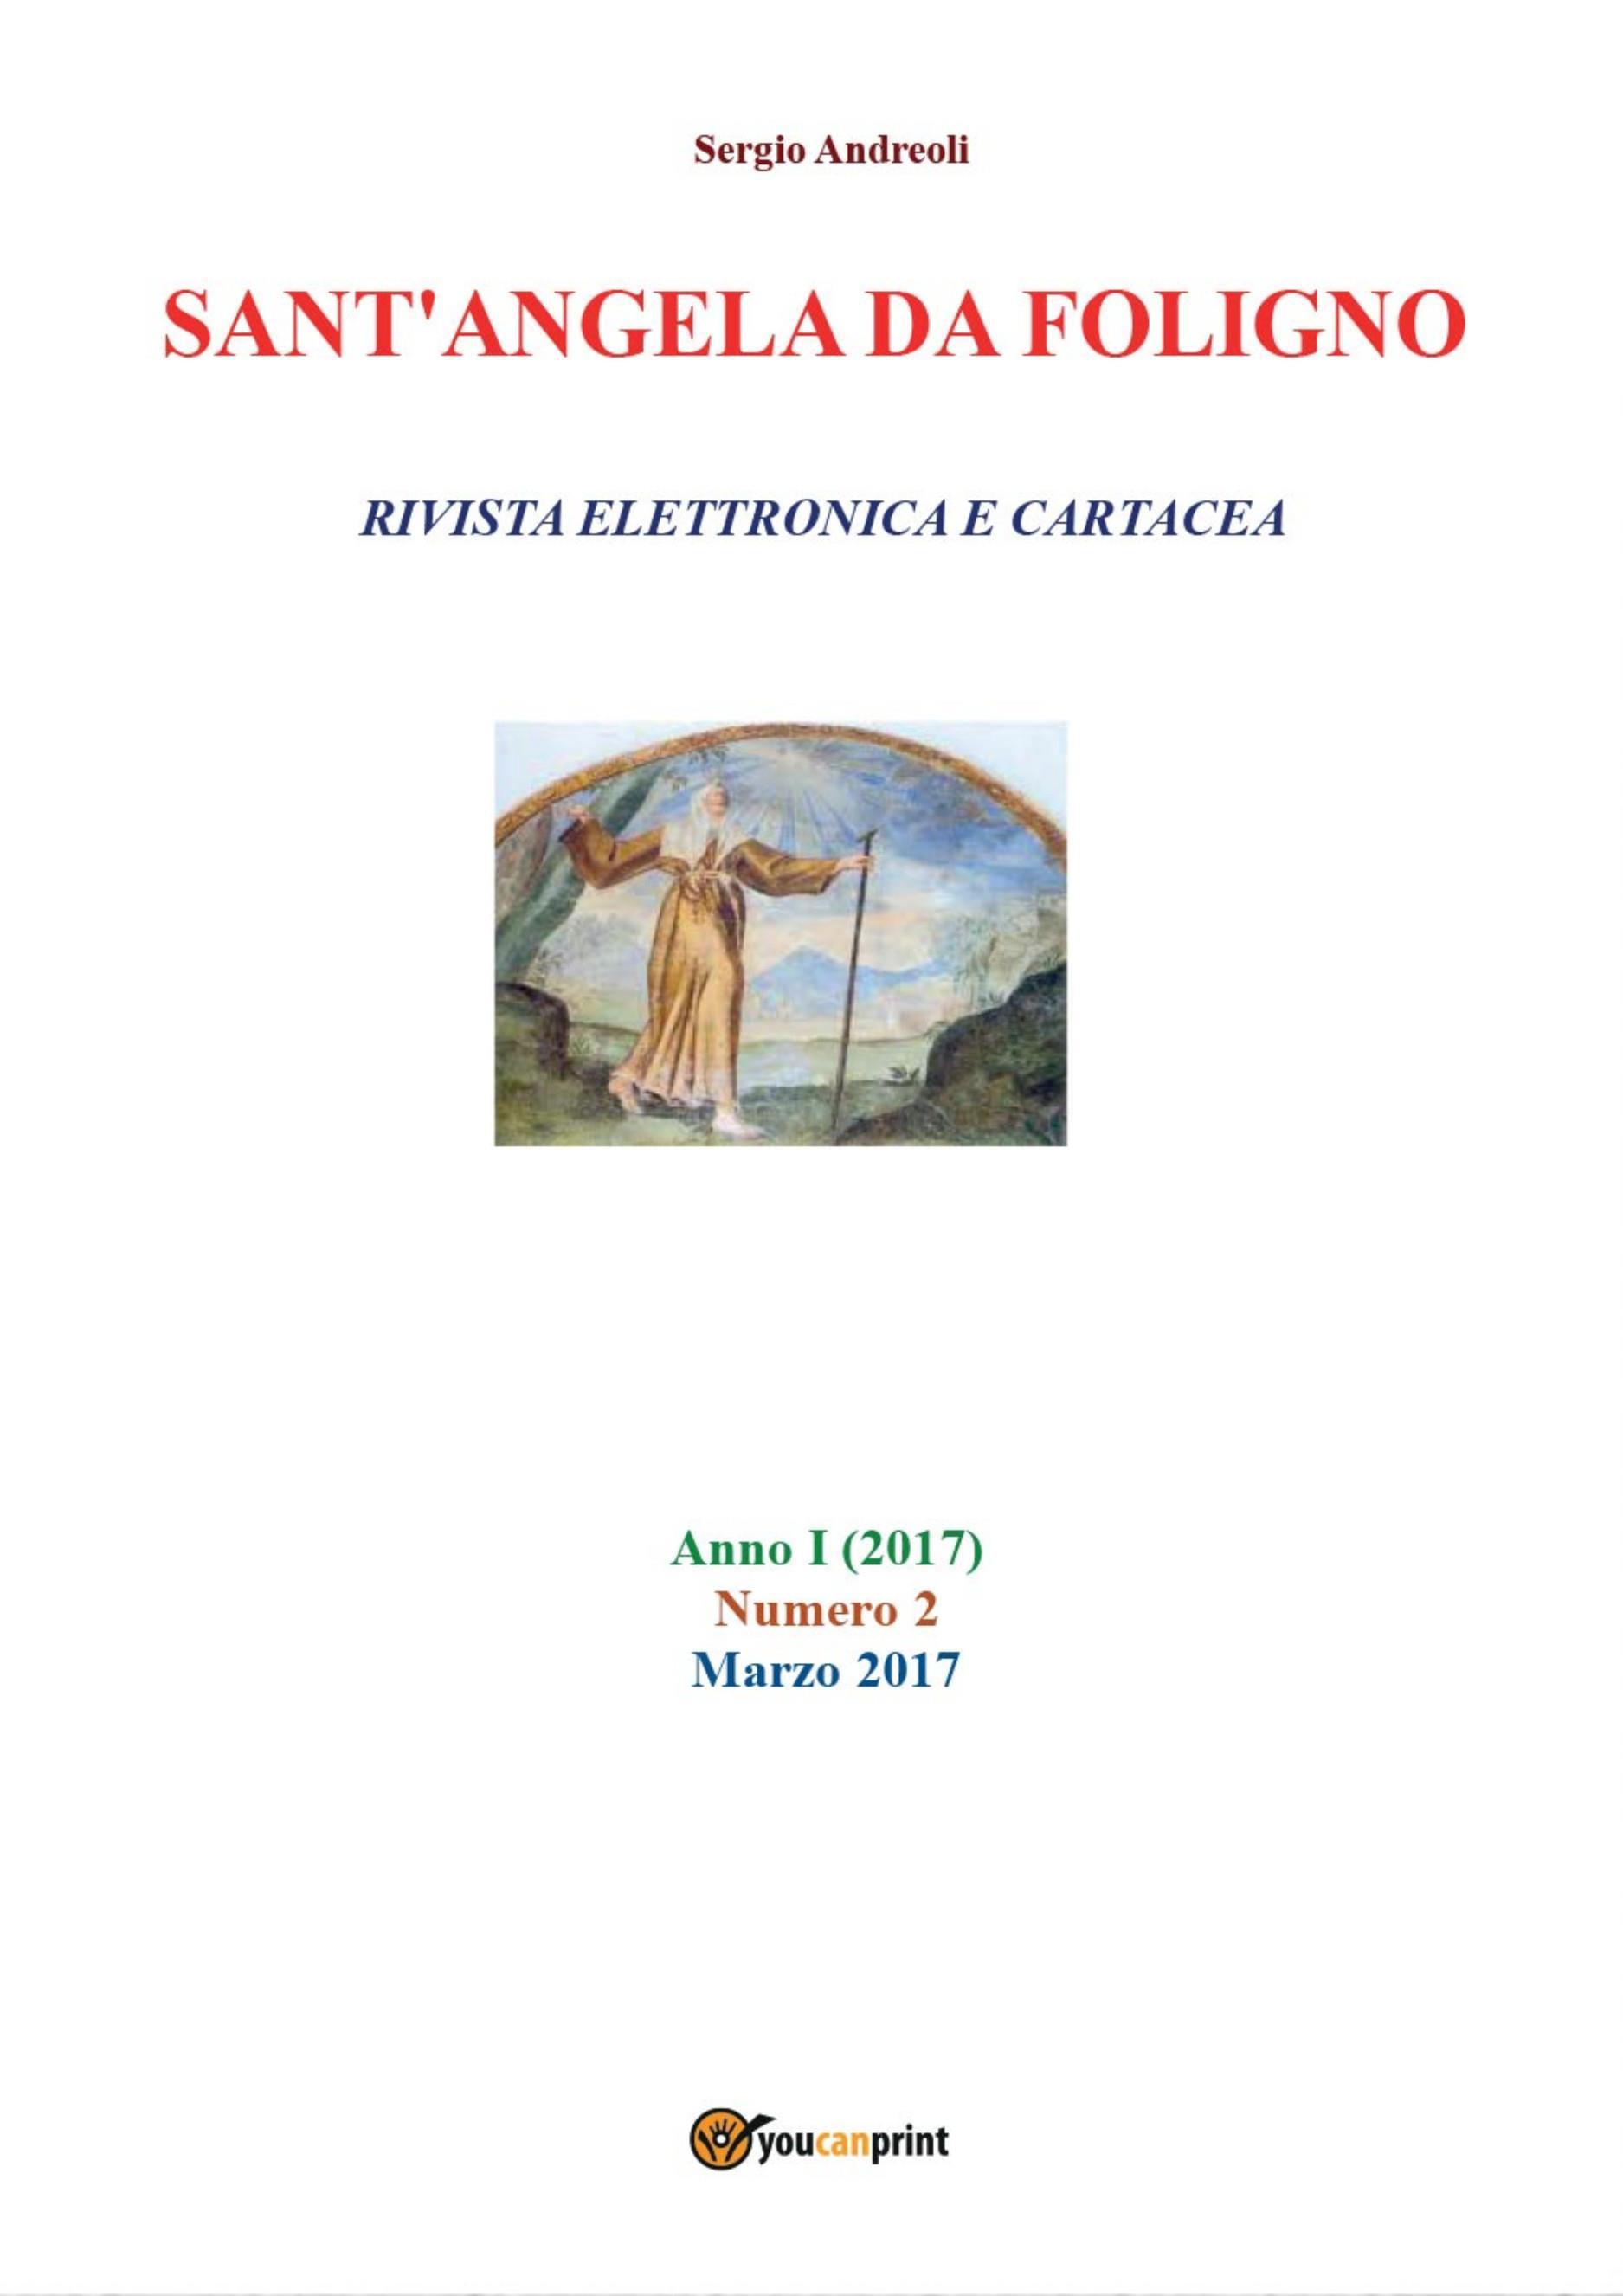 Sant'Angela da Foligno 2